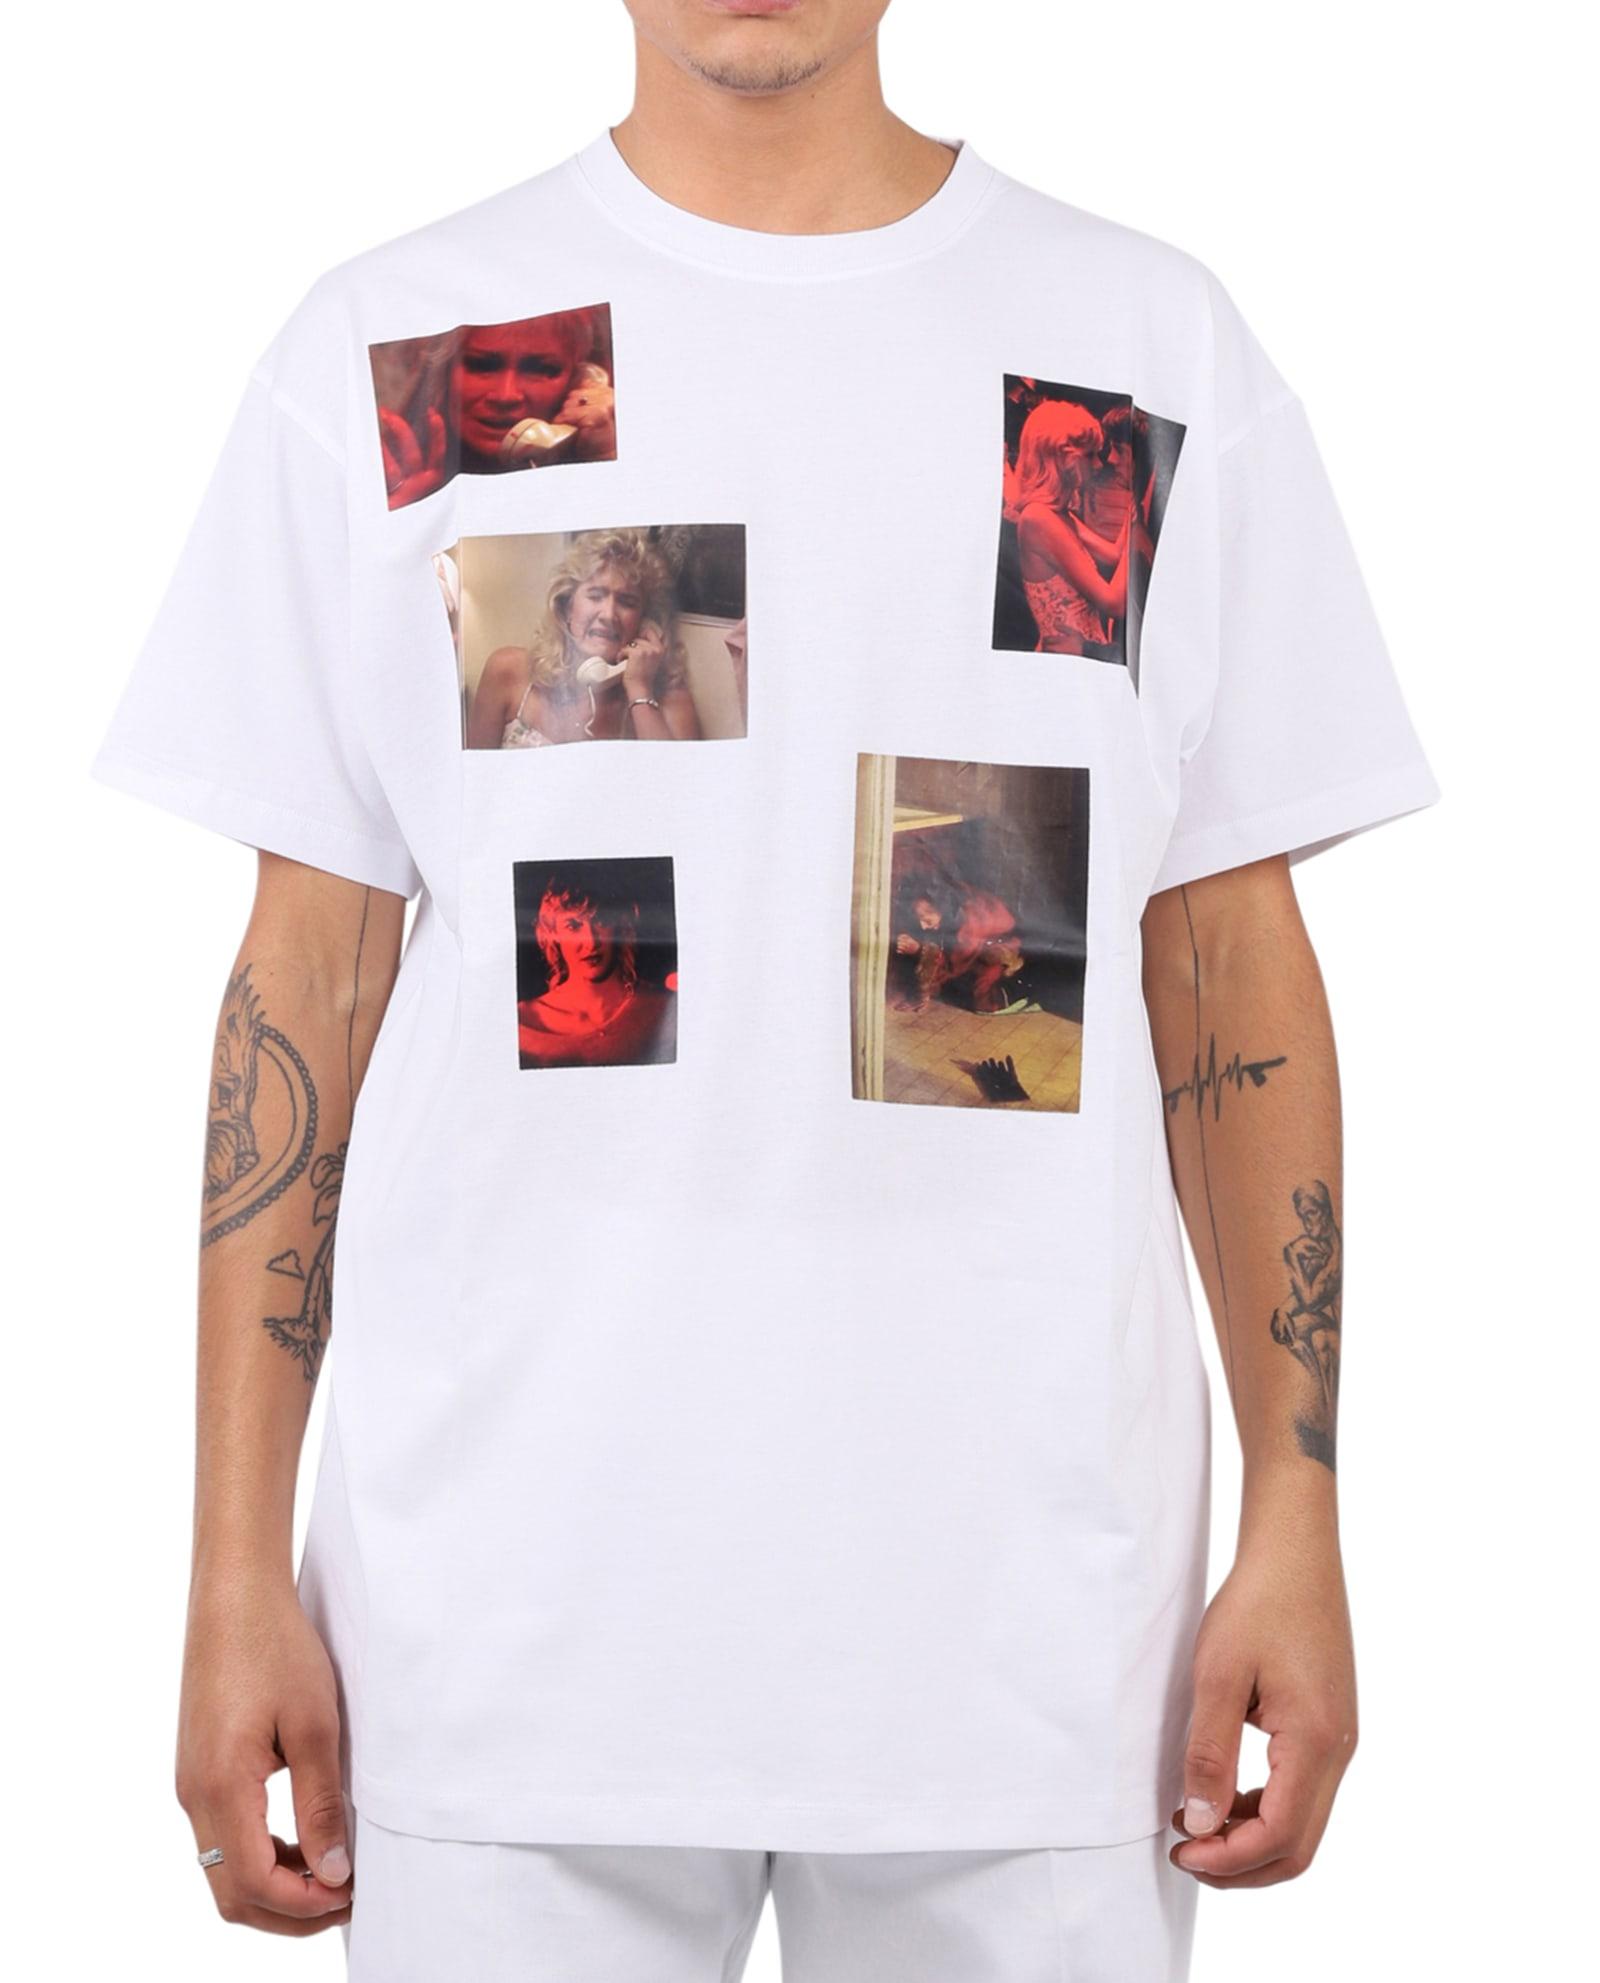 Raf Simons T-shirts WHITE LAURA DERN T-SHIRT